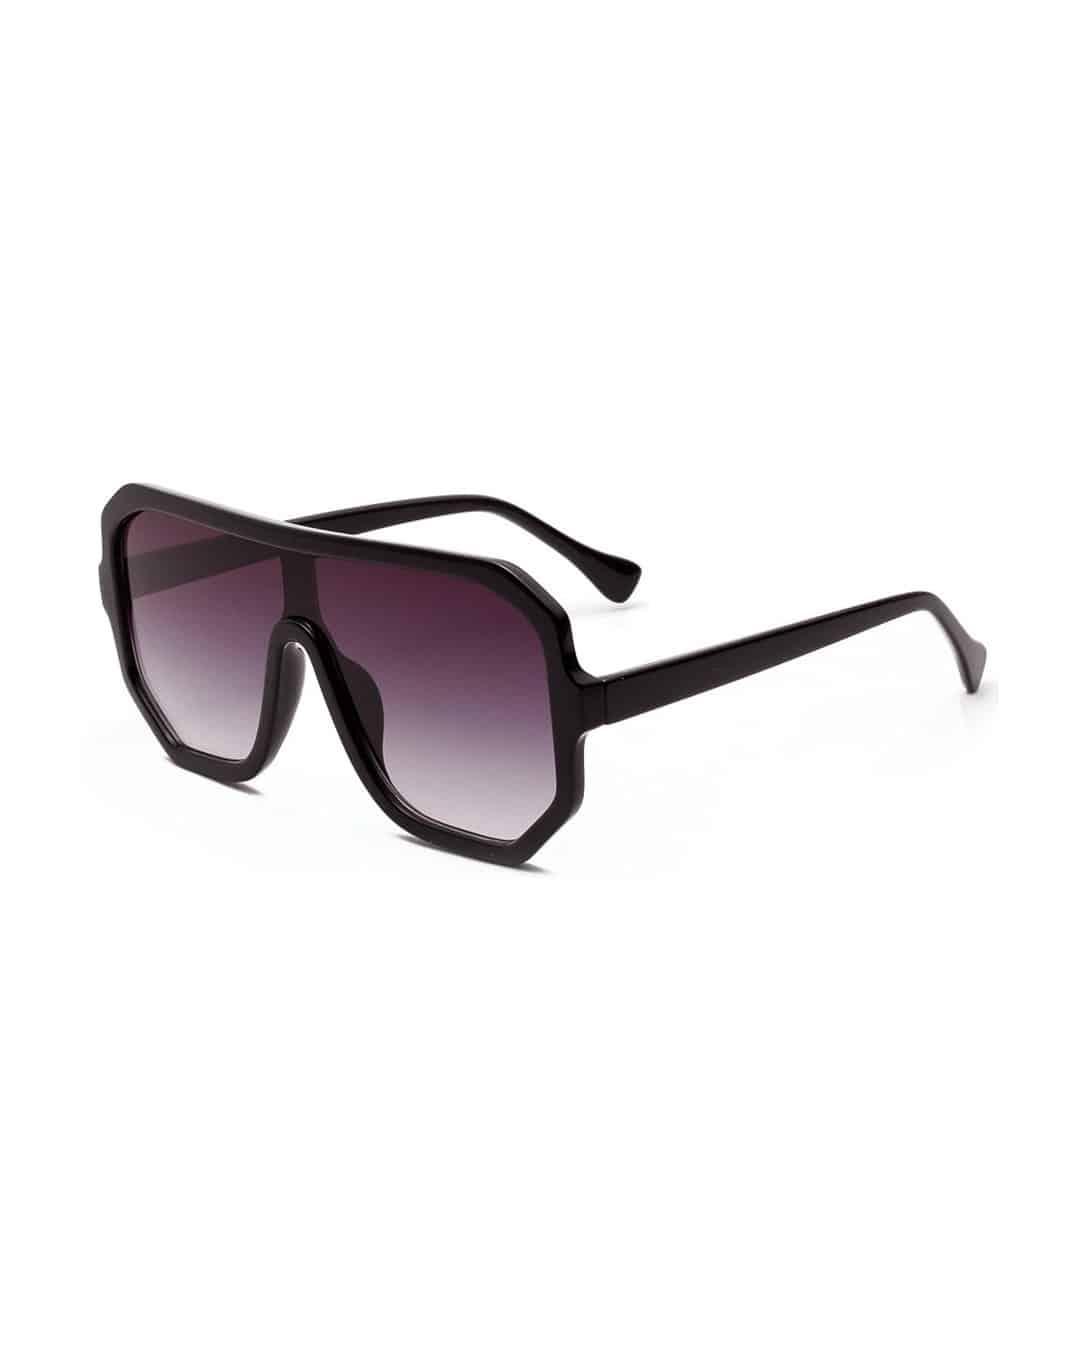 Zara-Shades-Black